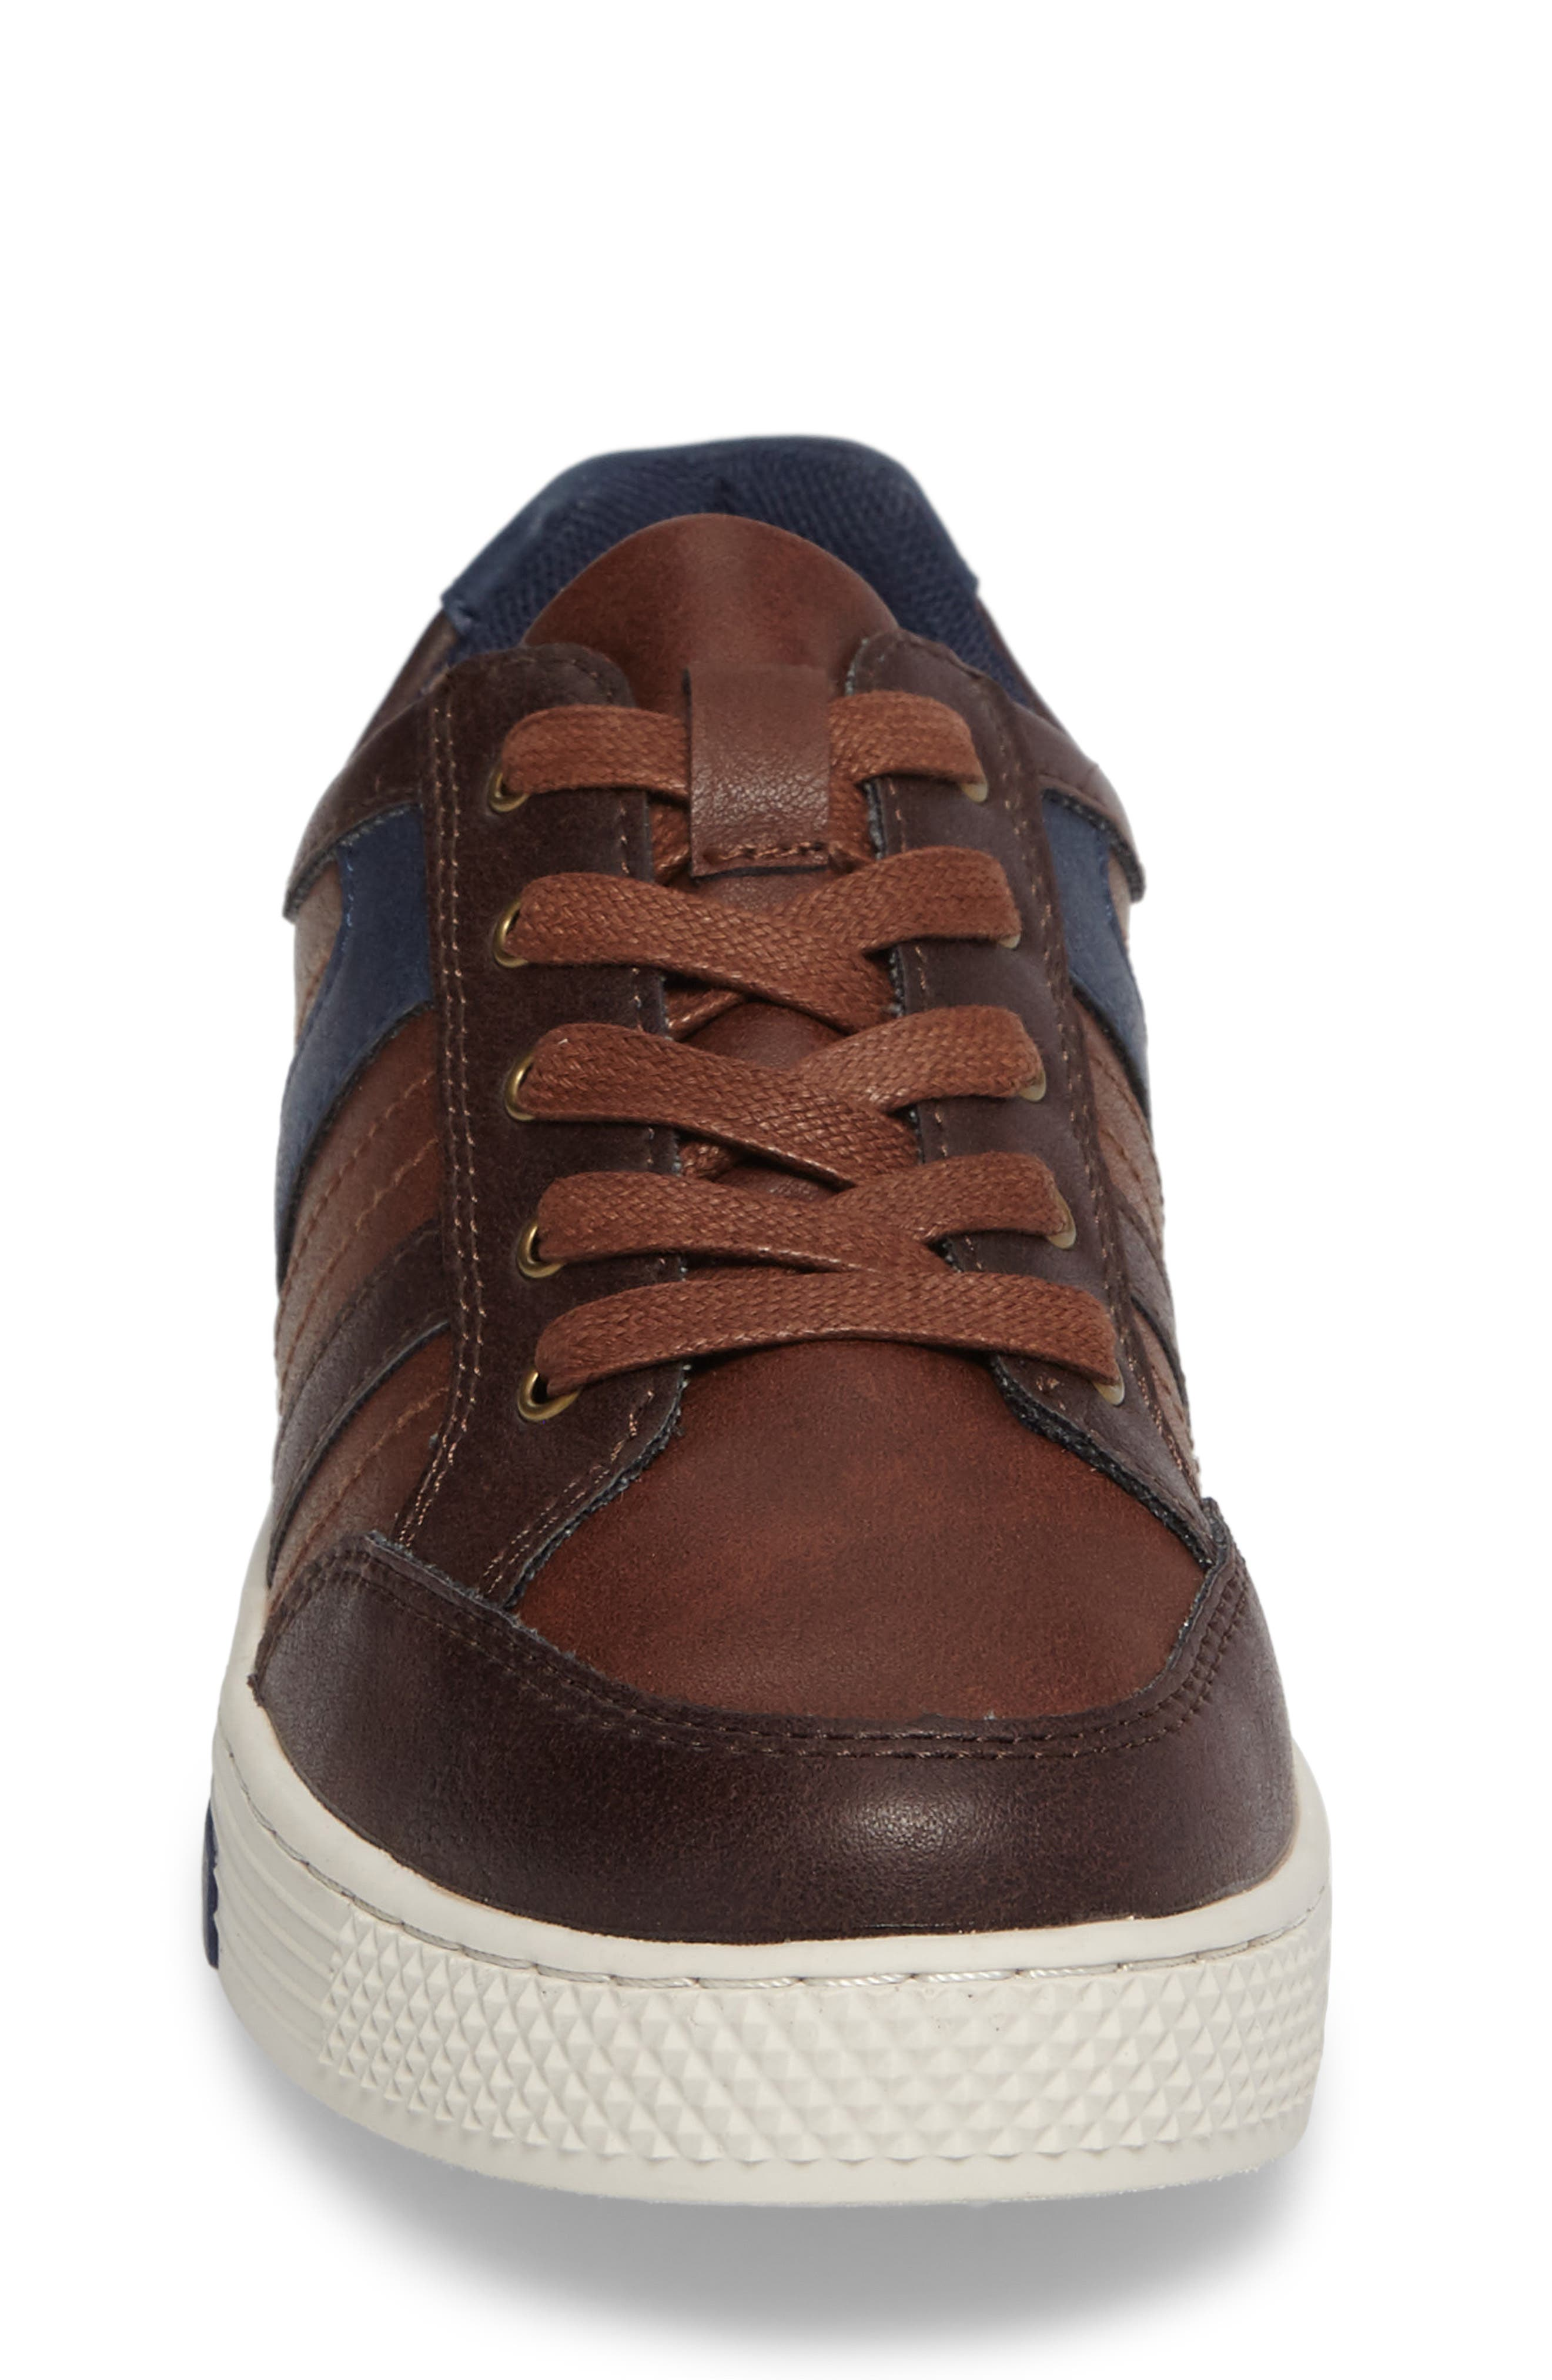 Trakk Sneaker,                             Alternate thumbnail 4, color,                             Brown Multi